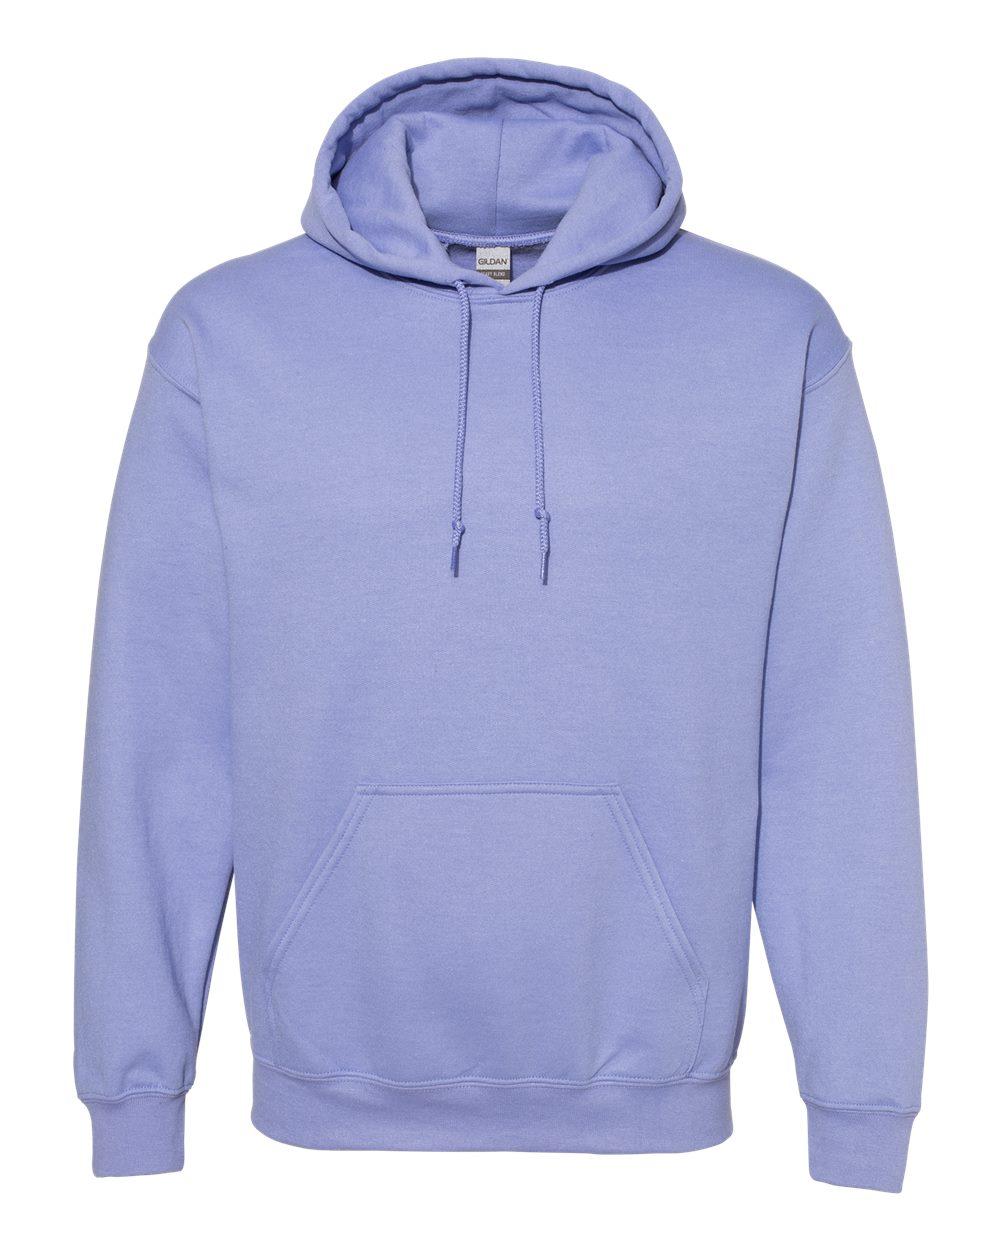 Gildan-Mens-Blank-Hoodie-Heavy-Blend-Hooded-Sweatshirt-Solid-18500-up-to-5XL thumbnail 98